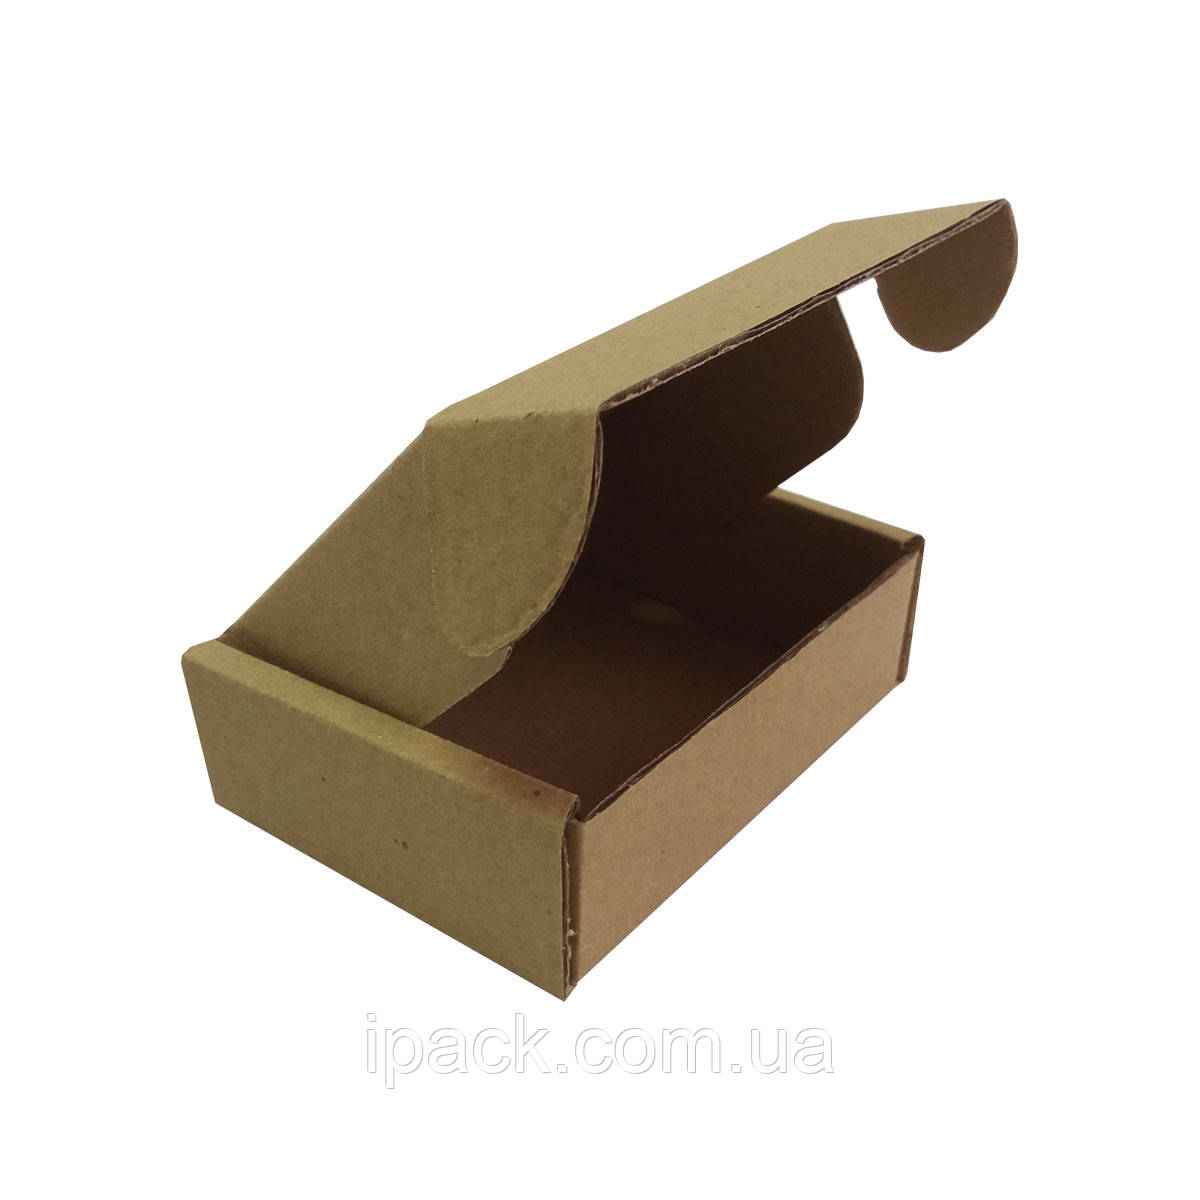 Коробка картонная самосборная 65*35*25 мм бурая крафт микрогофрокартон